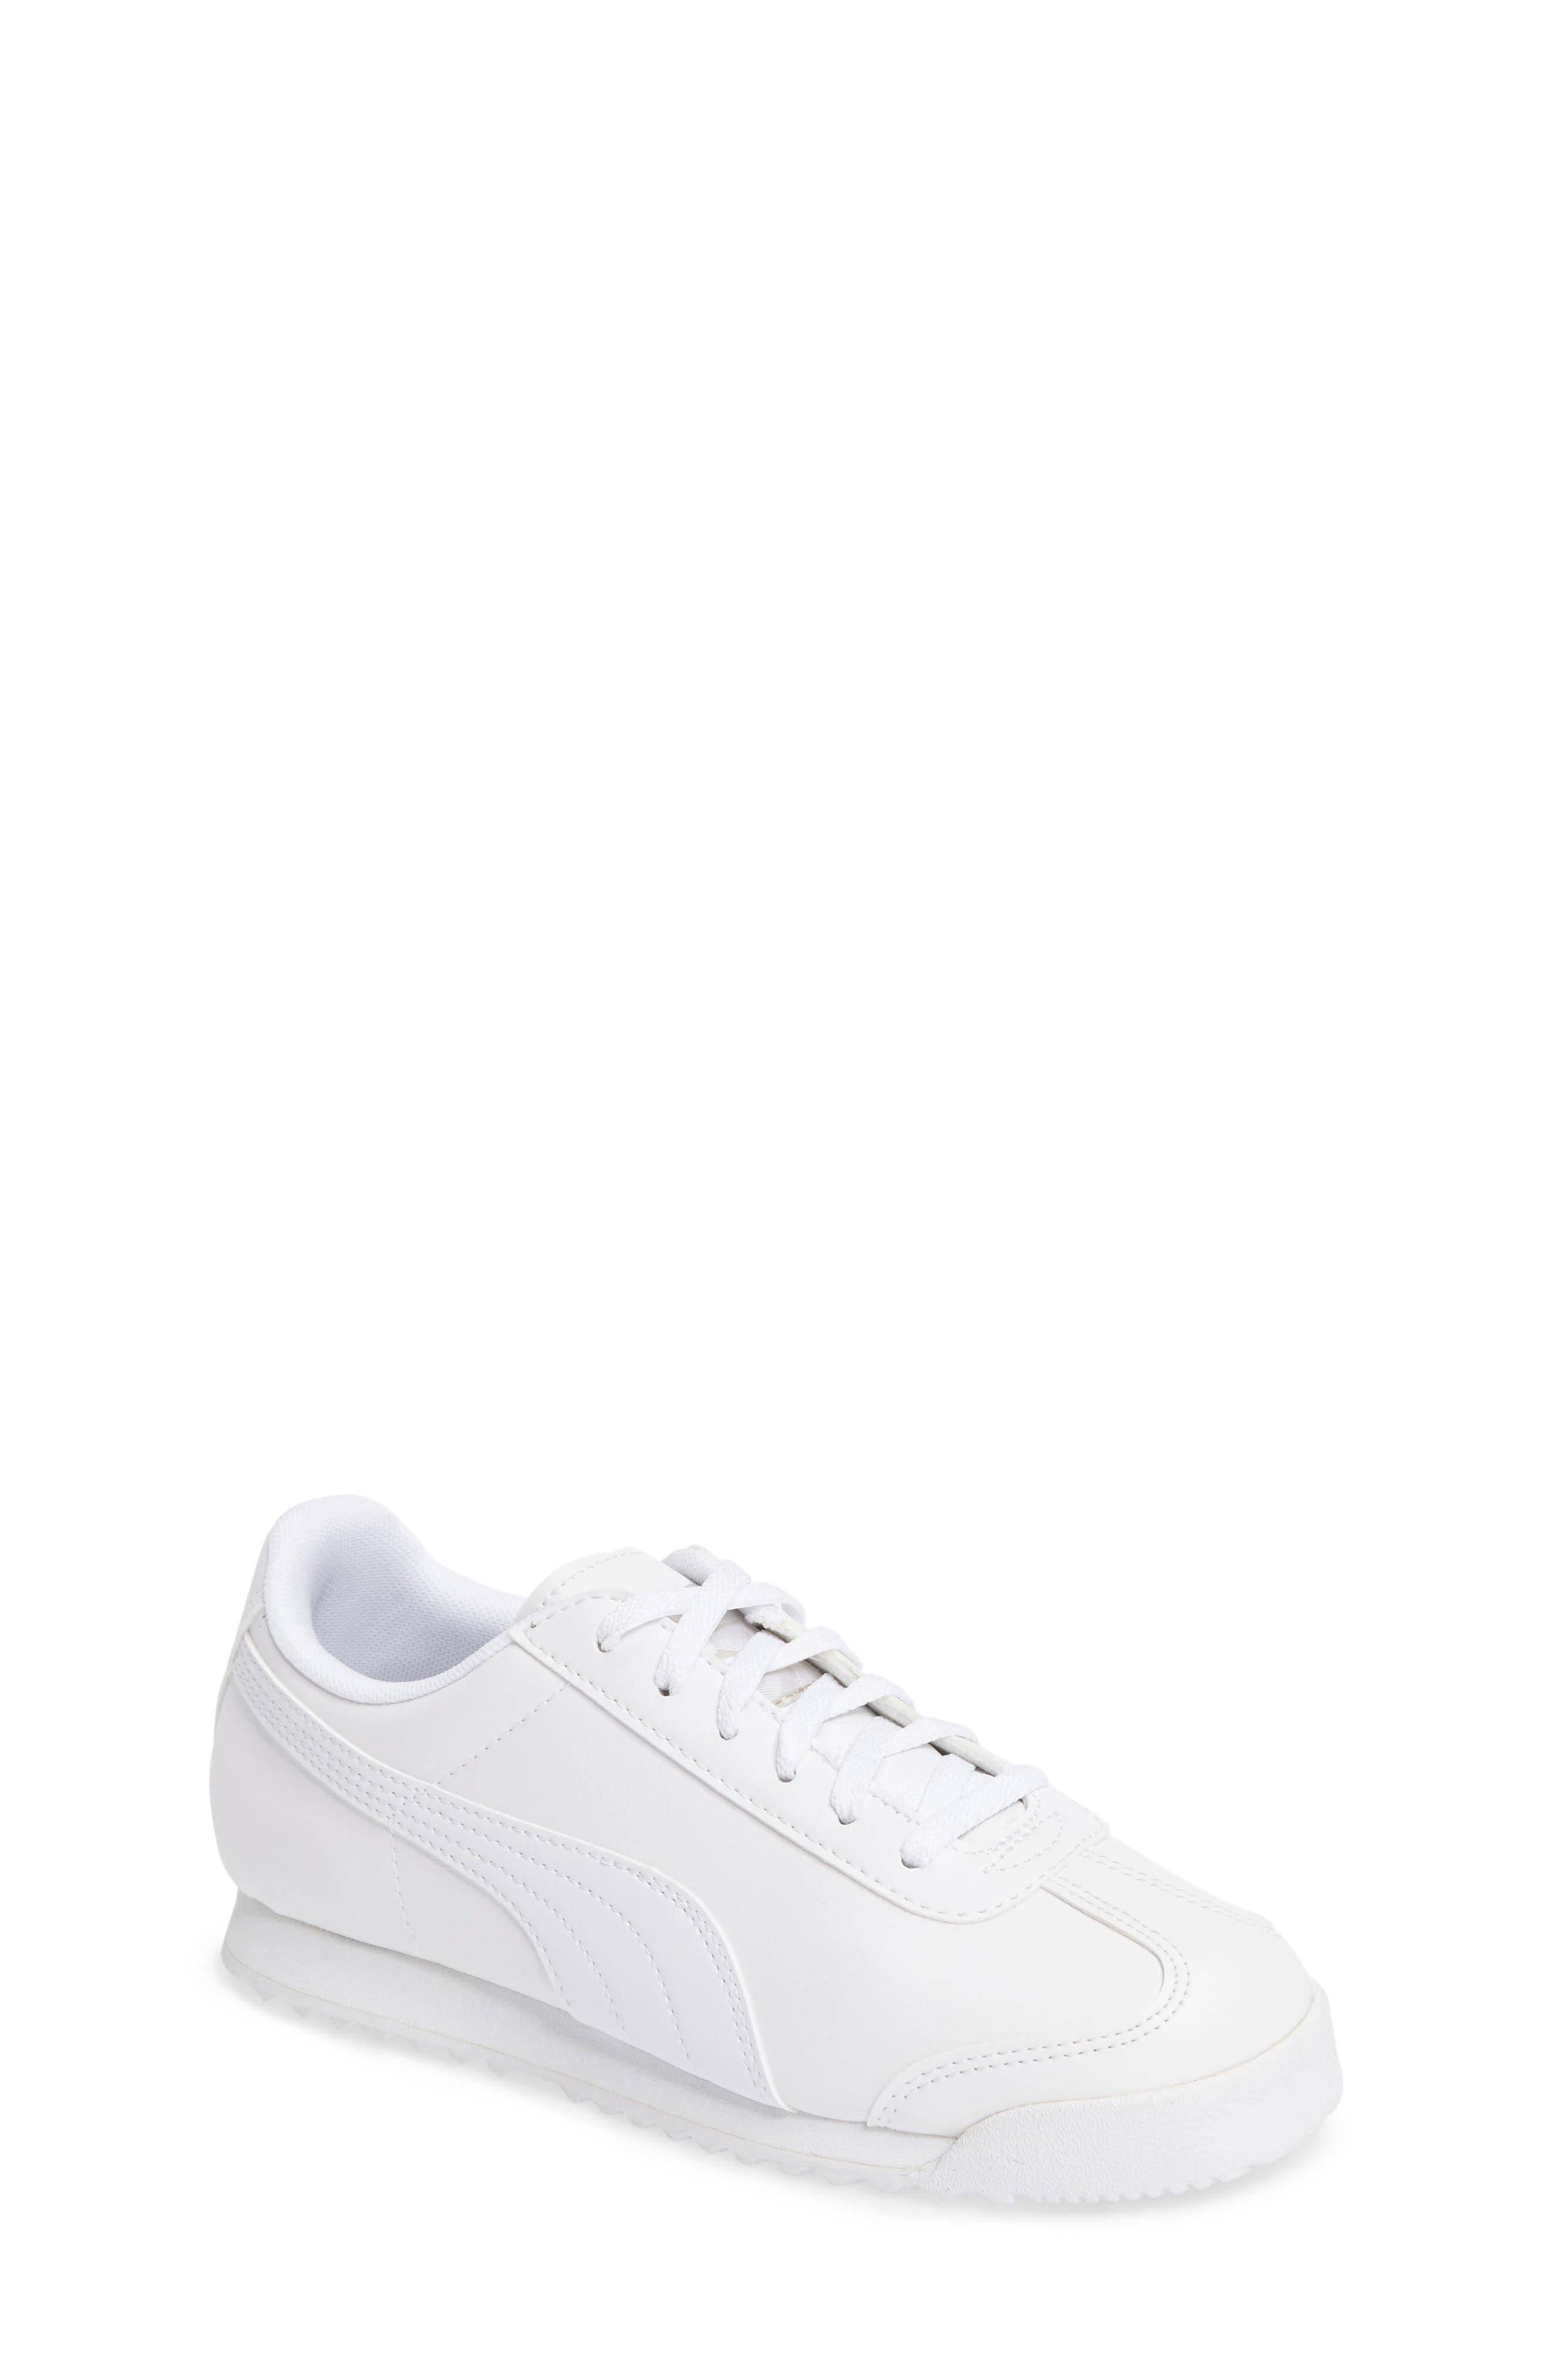 Roma Basic Sneaker,                             Main thumbnail 1, color,                             White/ Light Grey